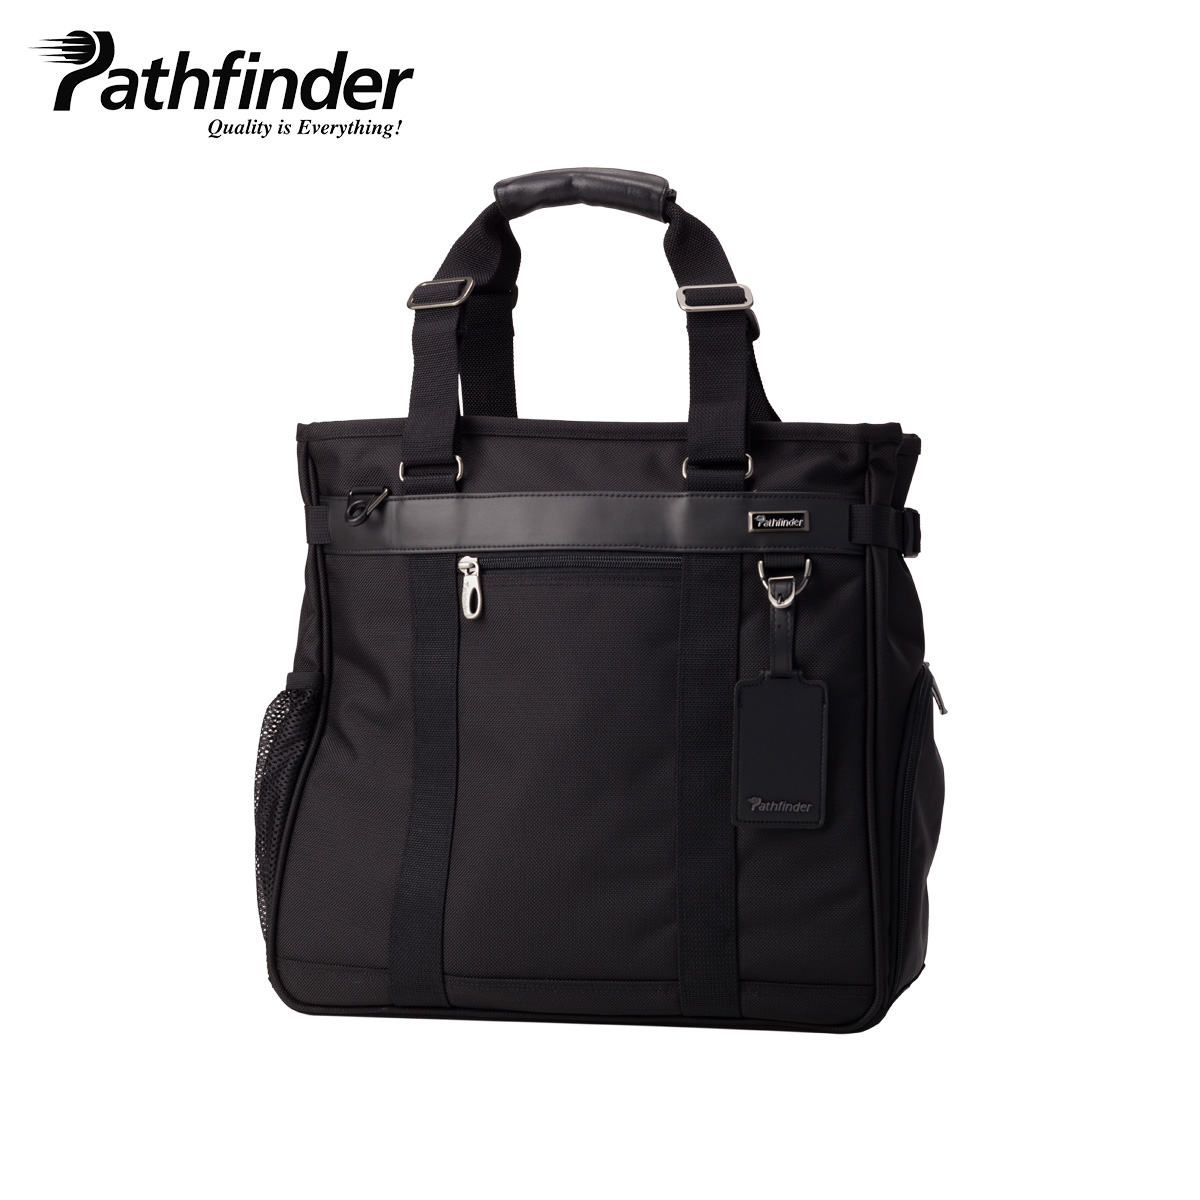 Pathfinder REVOLUTION XT パスファインダー トート バッグ ビジネスバッグ ショルダー メンズ ブラック 黒 PF6809B